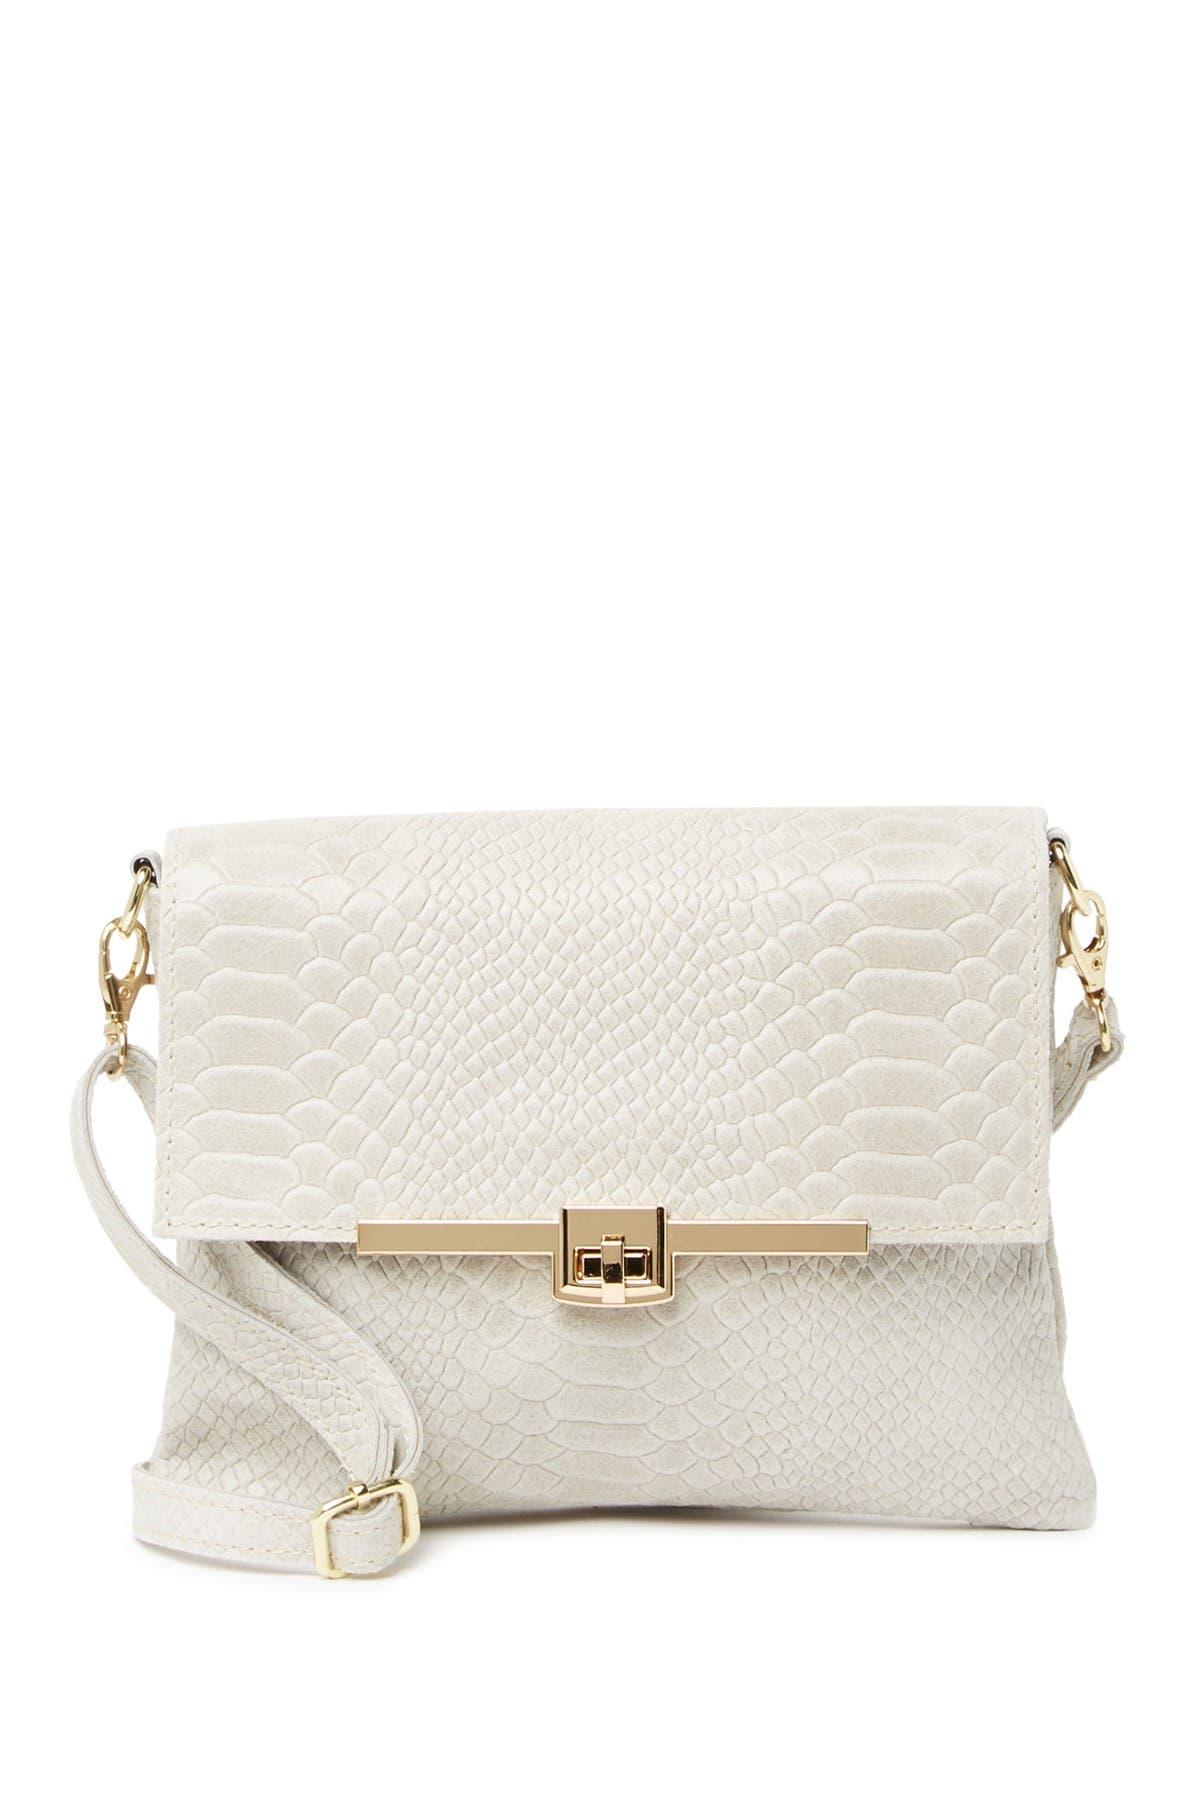 Image of Sofia Cardoni Crossbody Bag